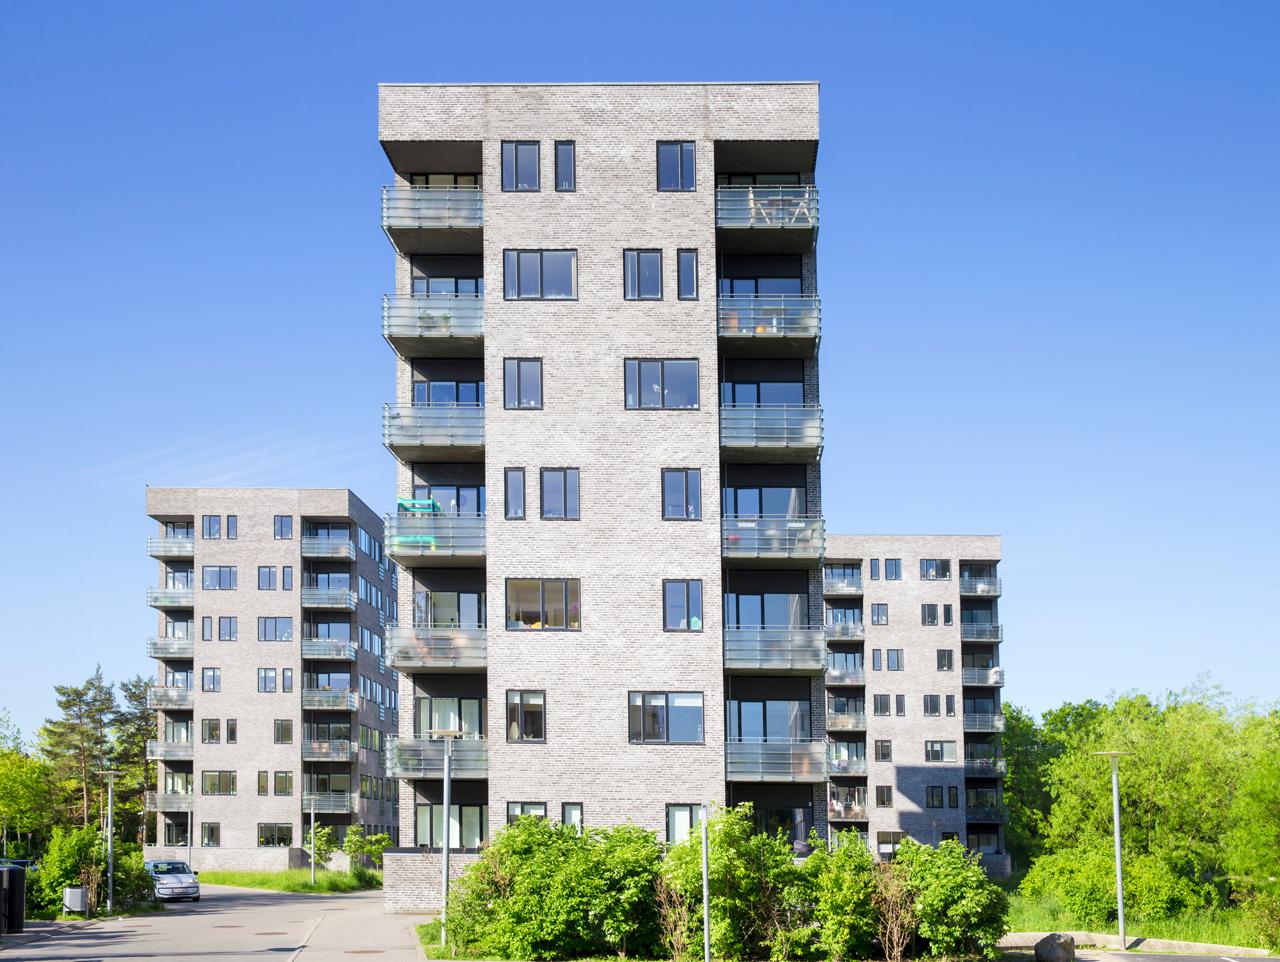 Gyngemose Parkvej, Højhus, skov, Søborg, ejerlejelighed, etage, altan, arkitekturfotograf